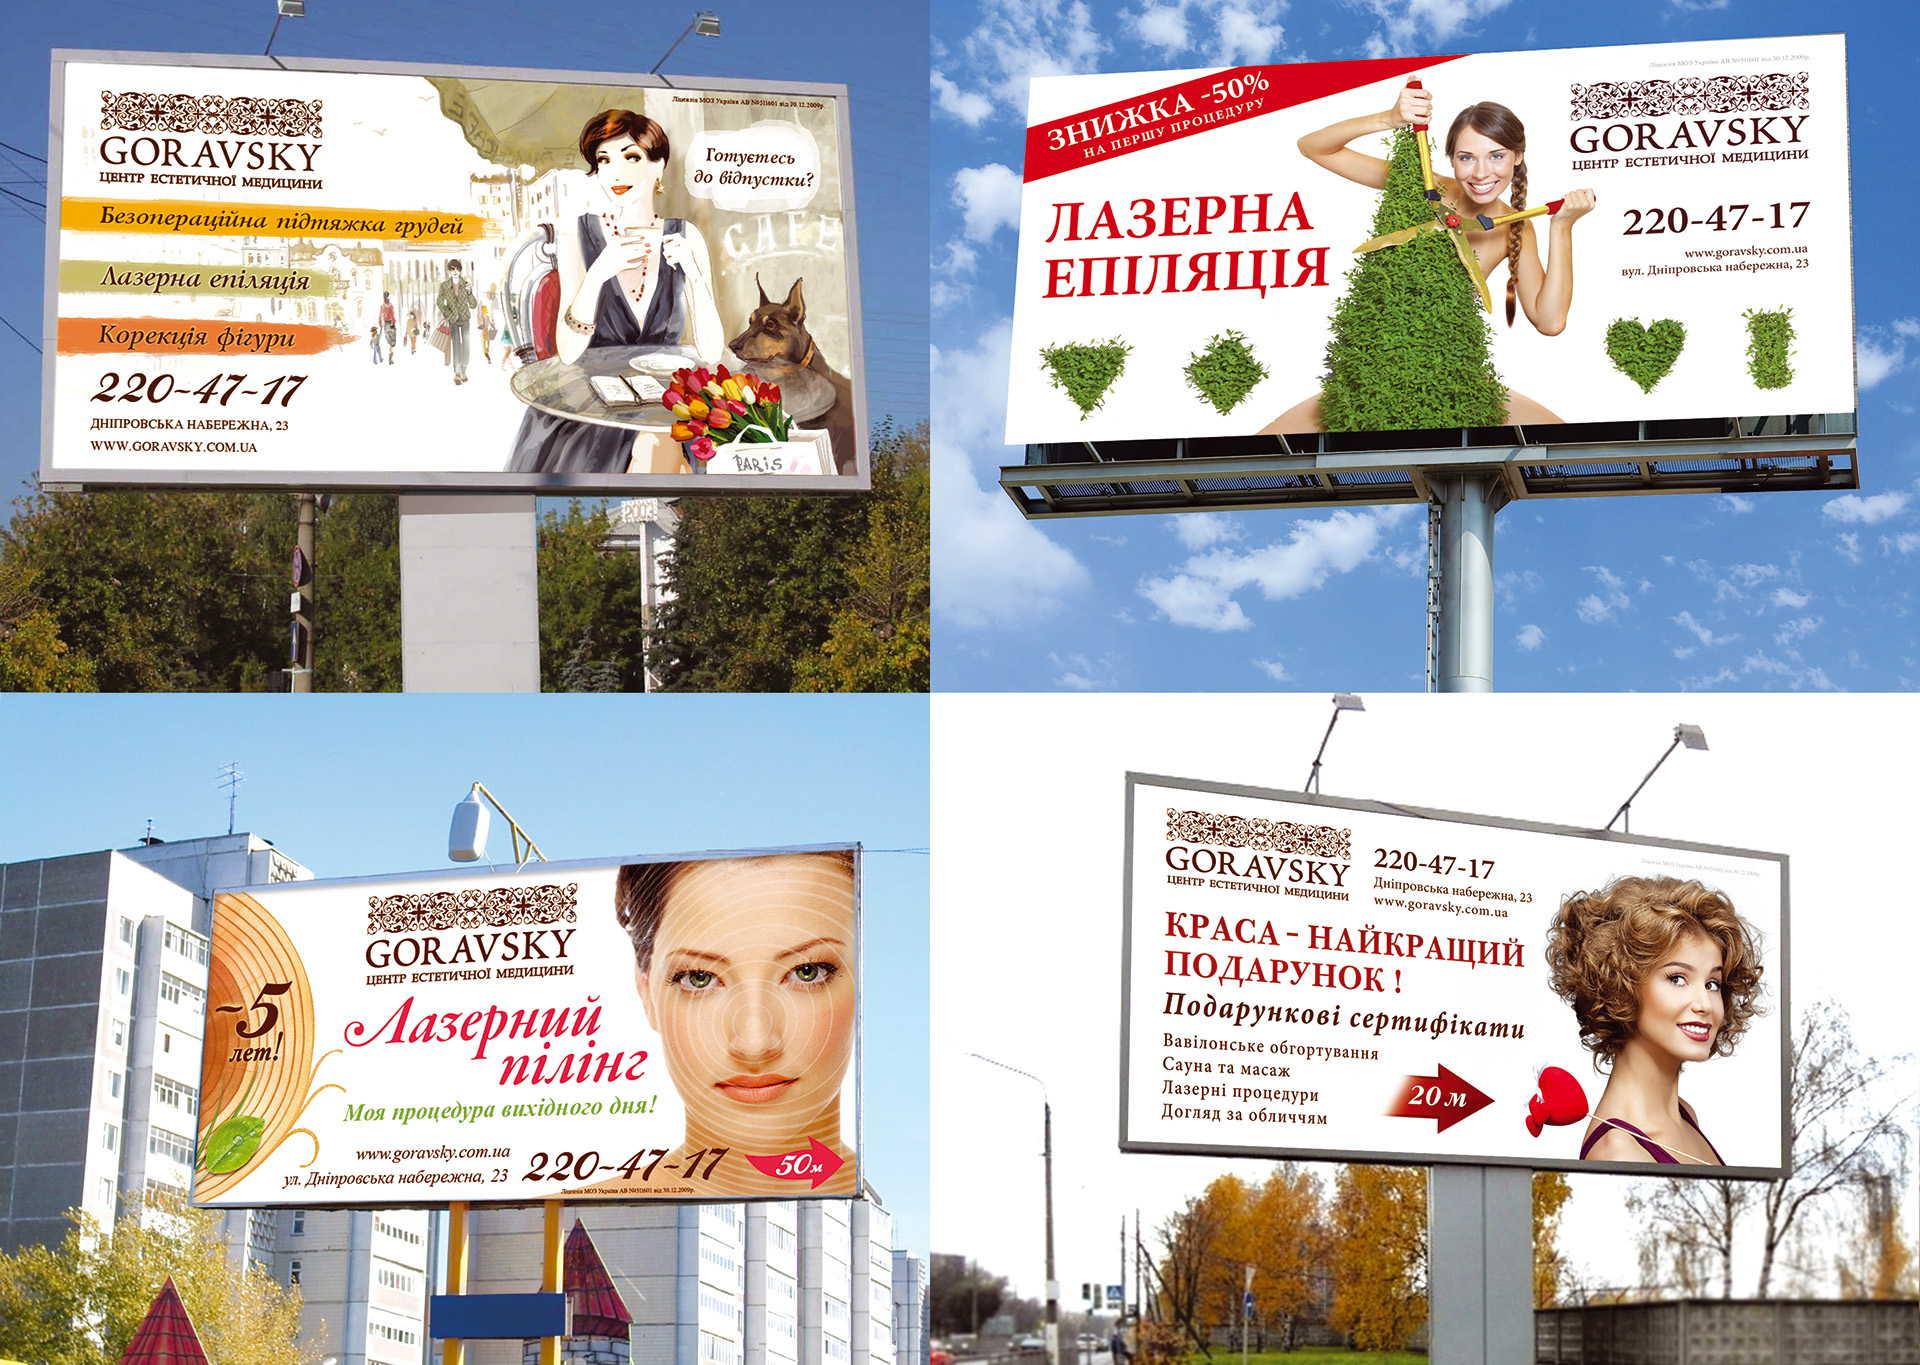 Дизайн билборда для медицинской клиники, billboard design for medical clinic